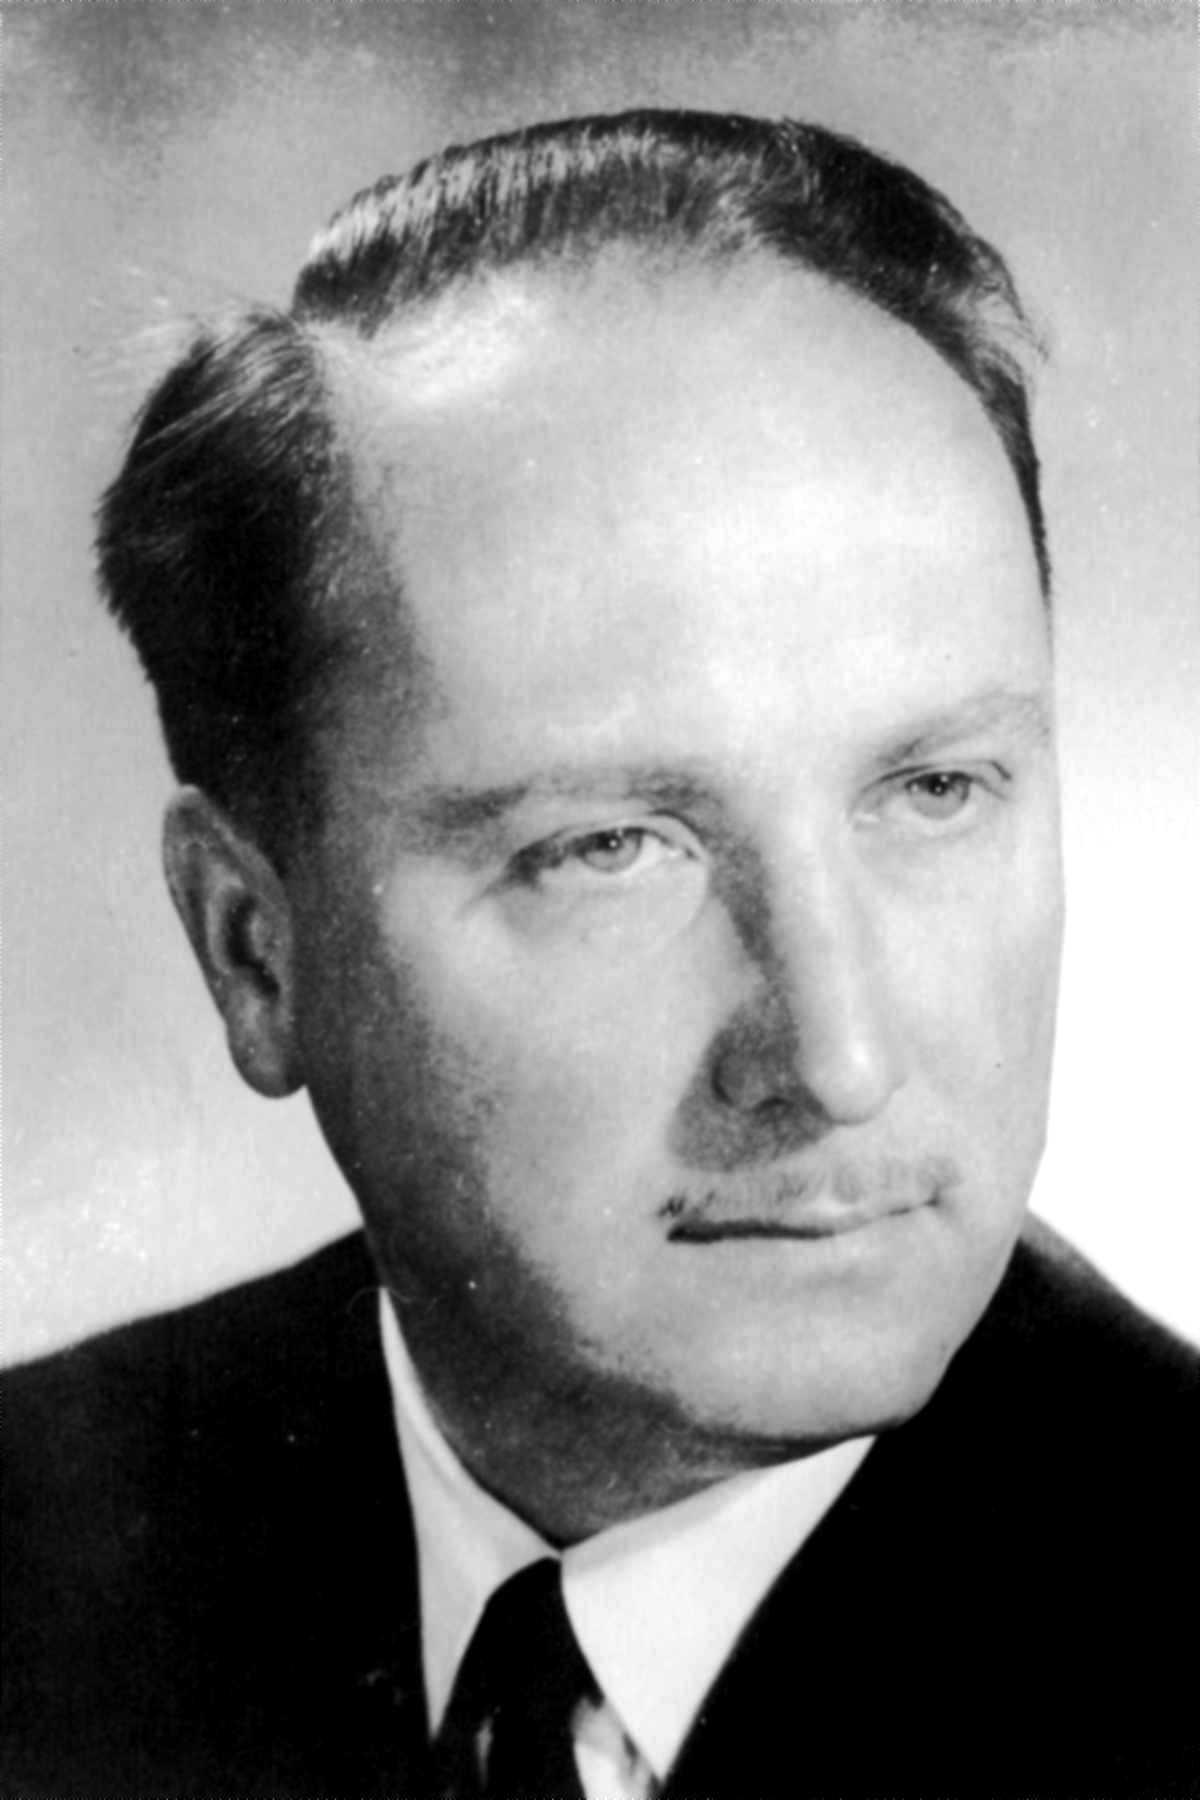 Siegfried Heuser